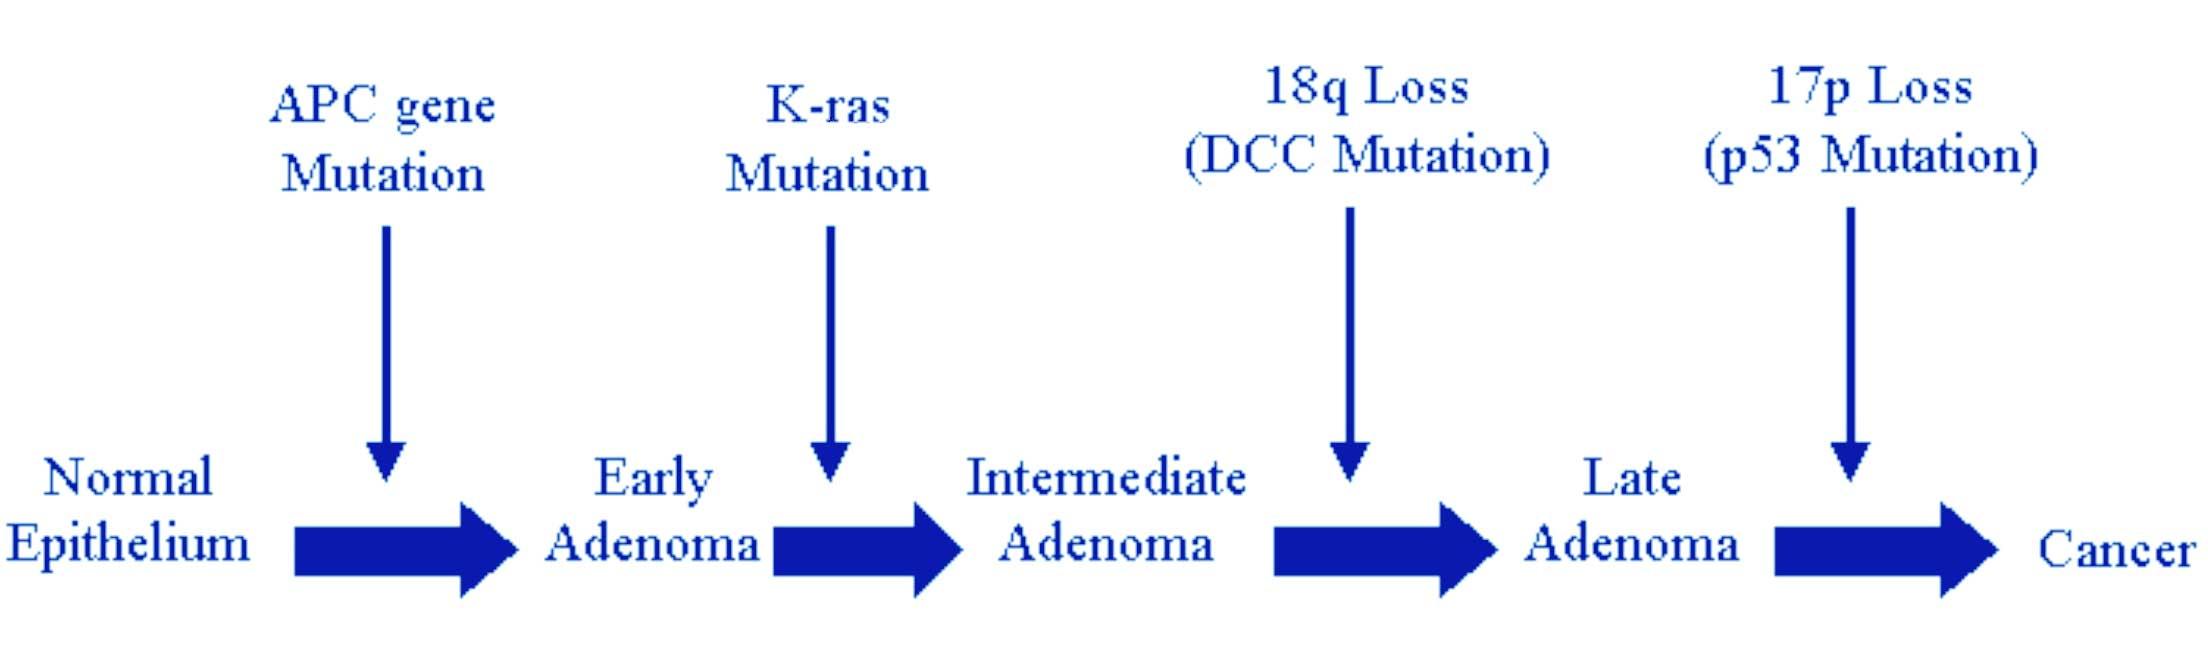 warts bladder papilloma hpv virus test frauen